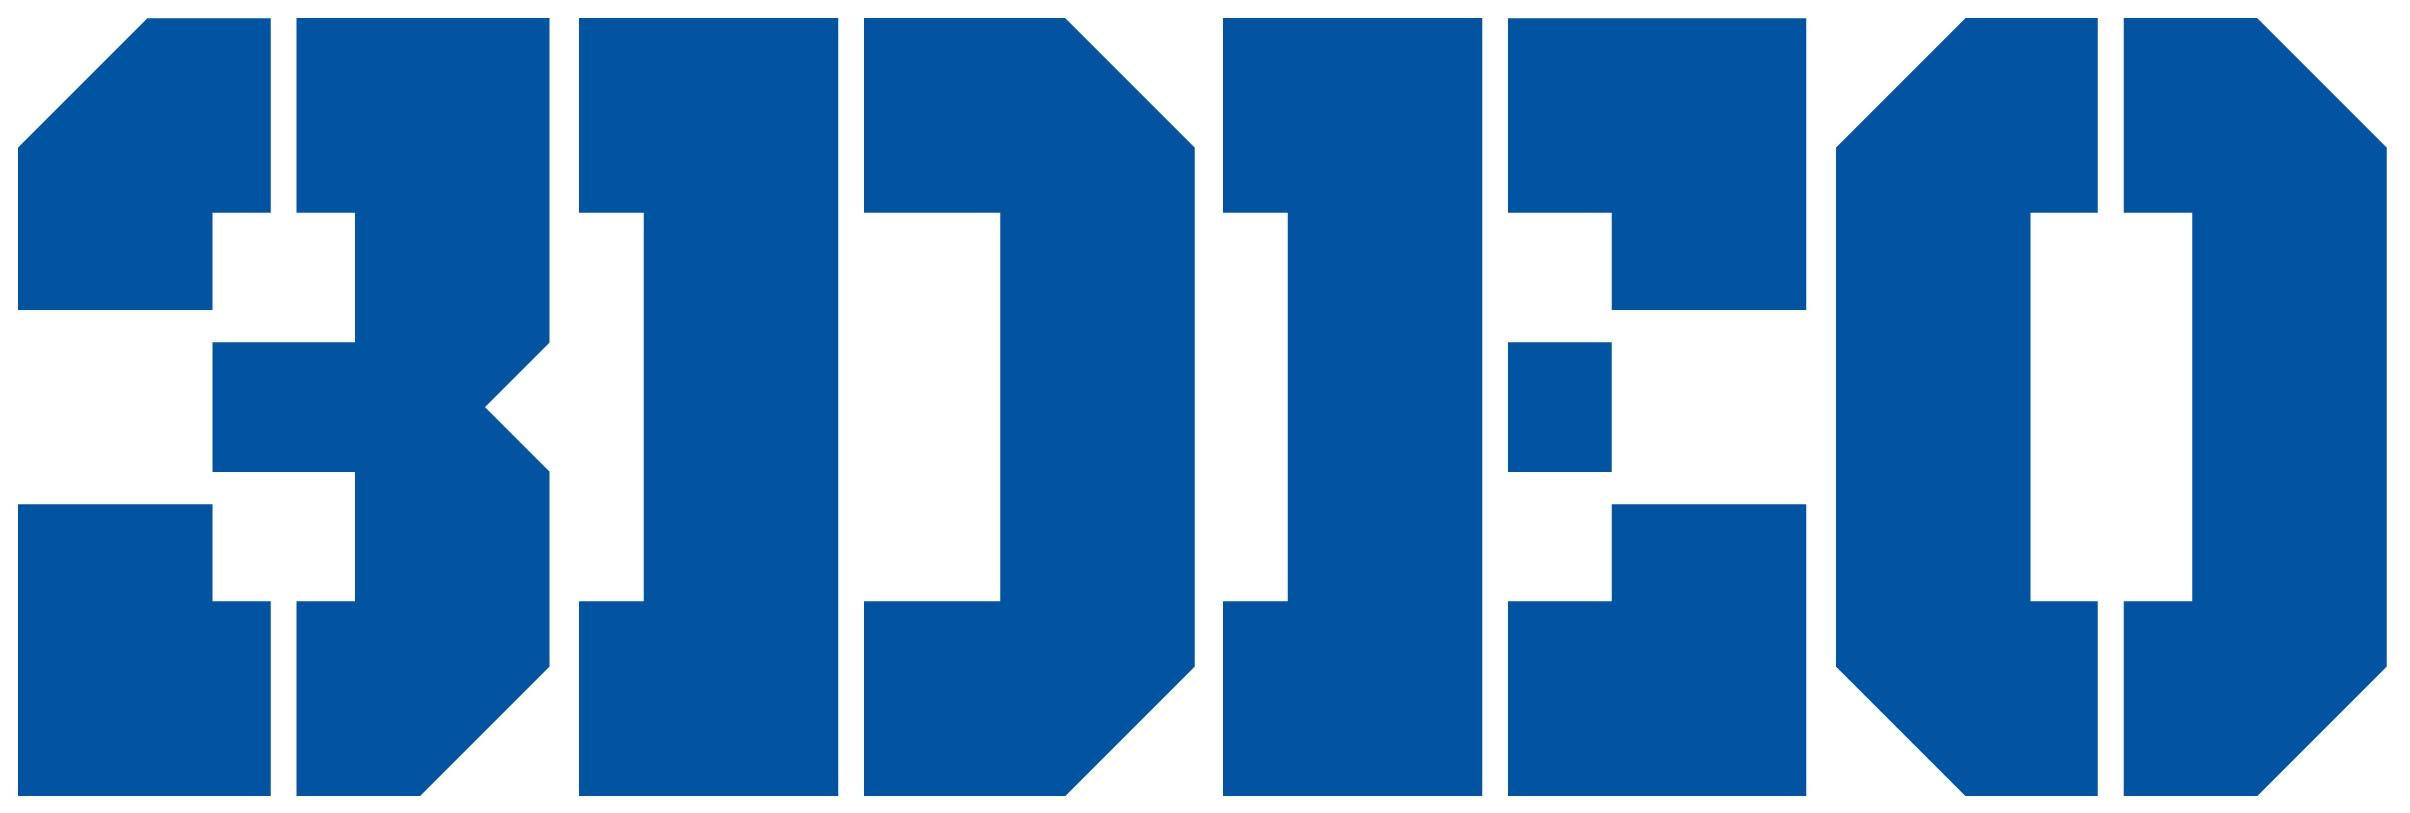 Made-in-California-manufacturer-3DEO-logo.jpg